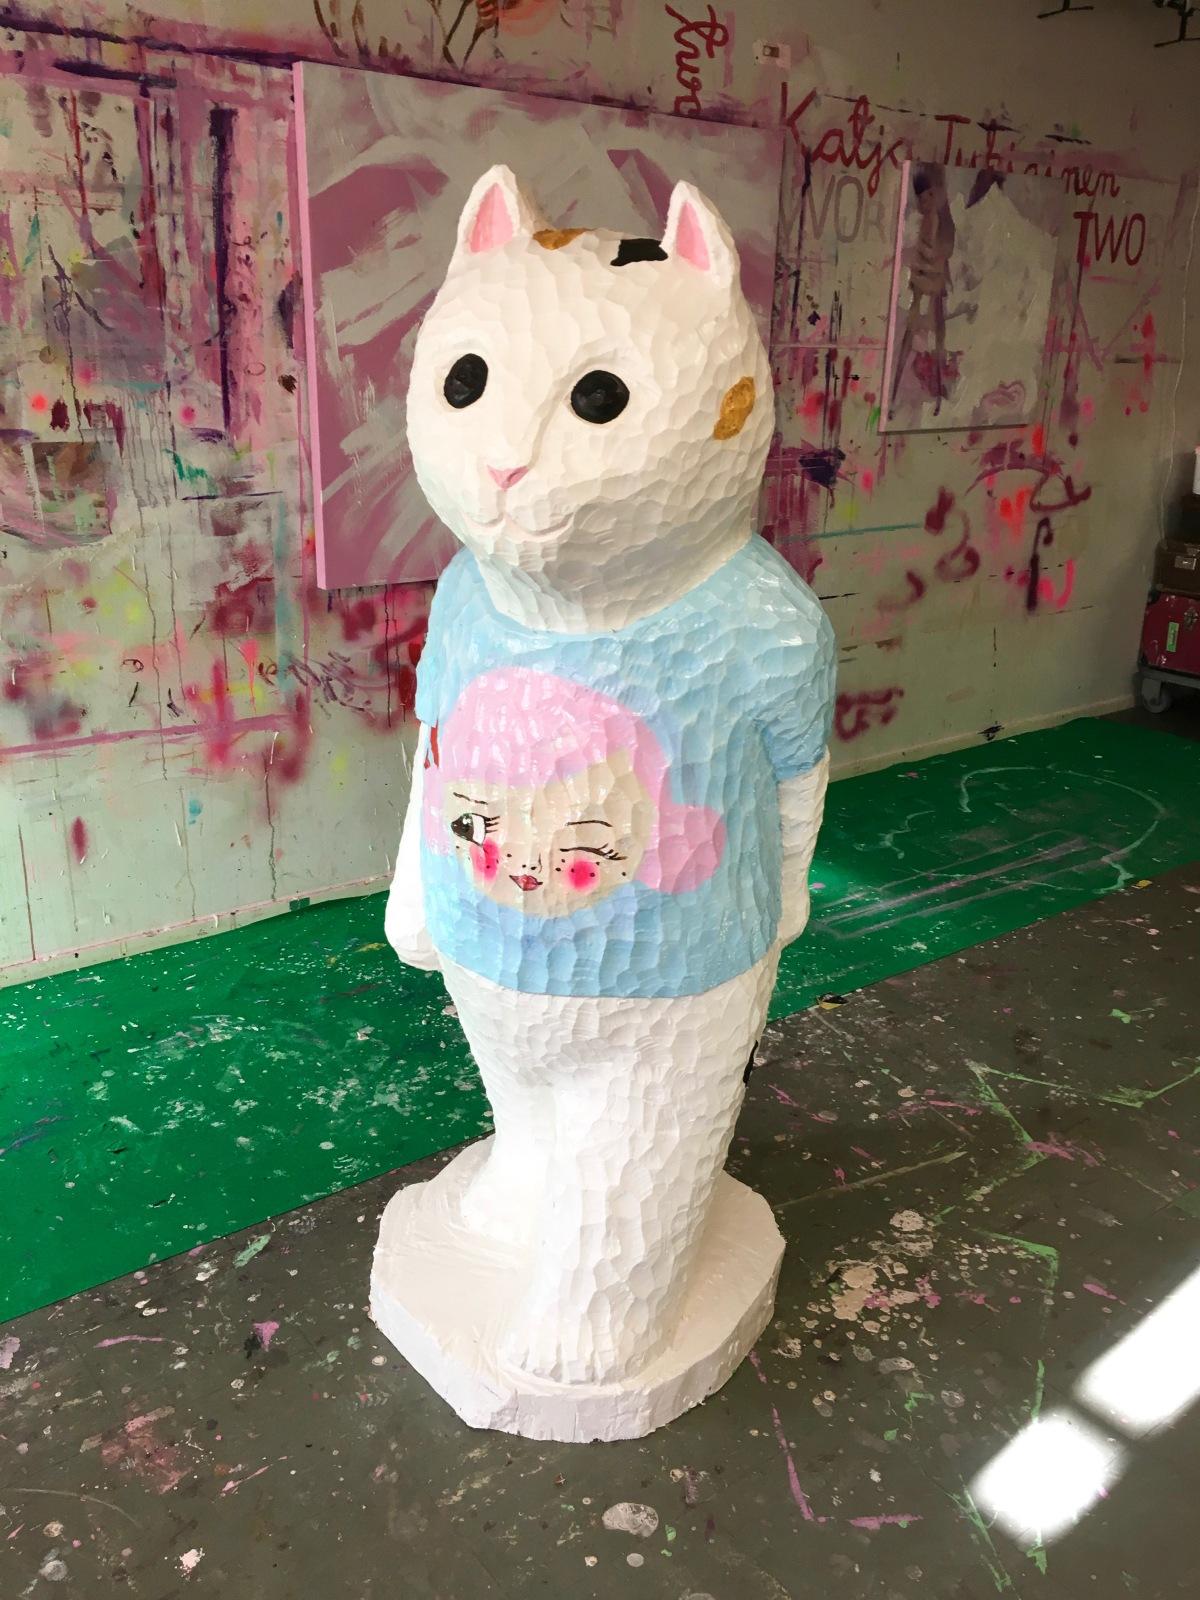 yasushi-koyama-walking-cat-with-tshirt-by-katja-tukiainen-2016-birch-house-paint